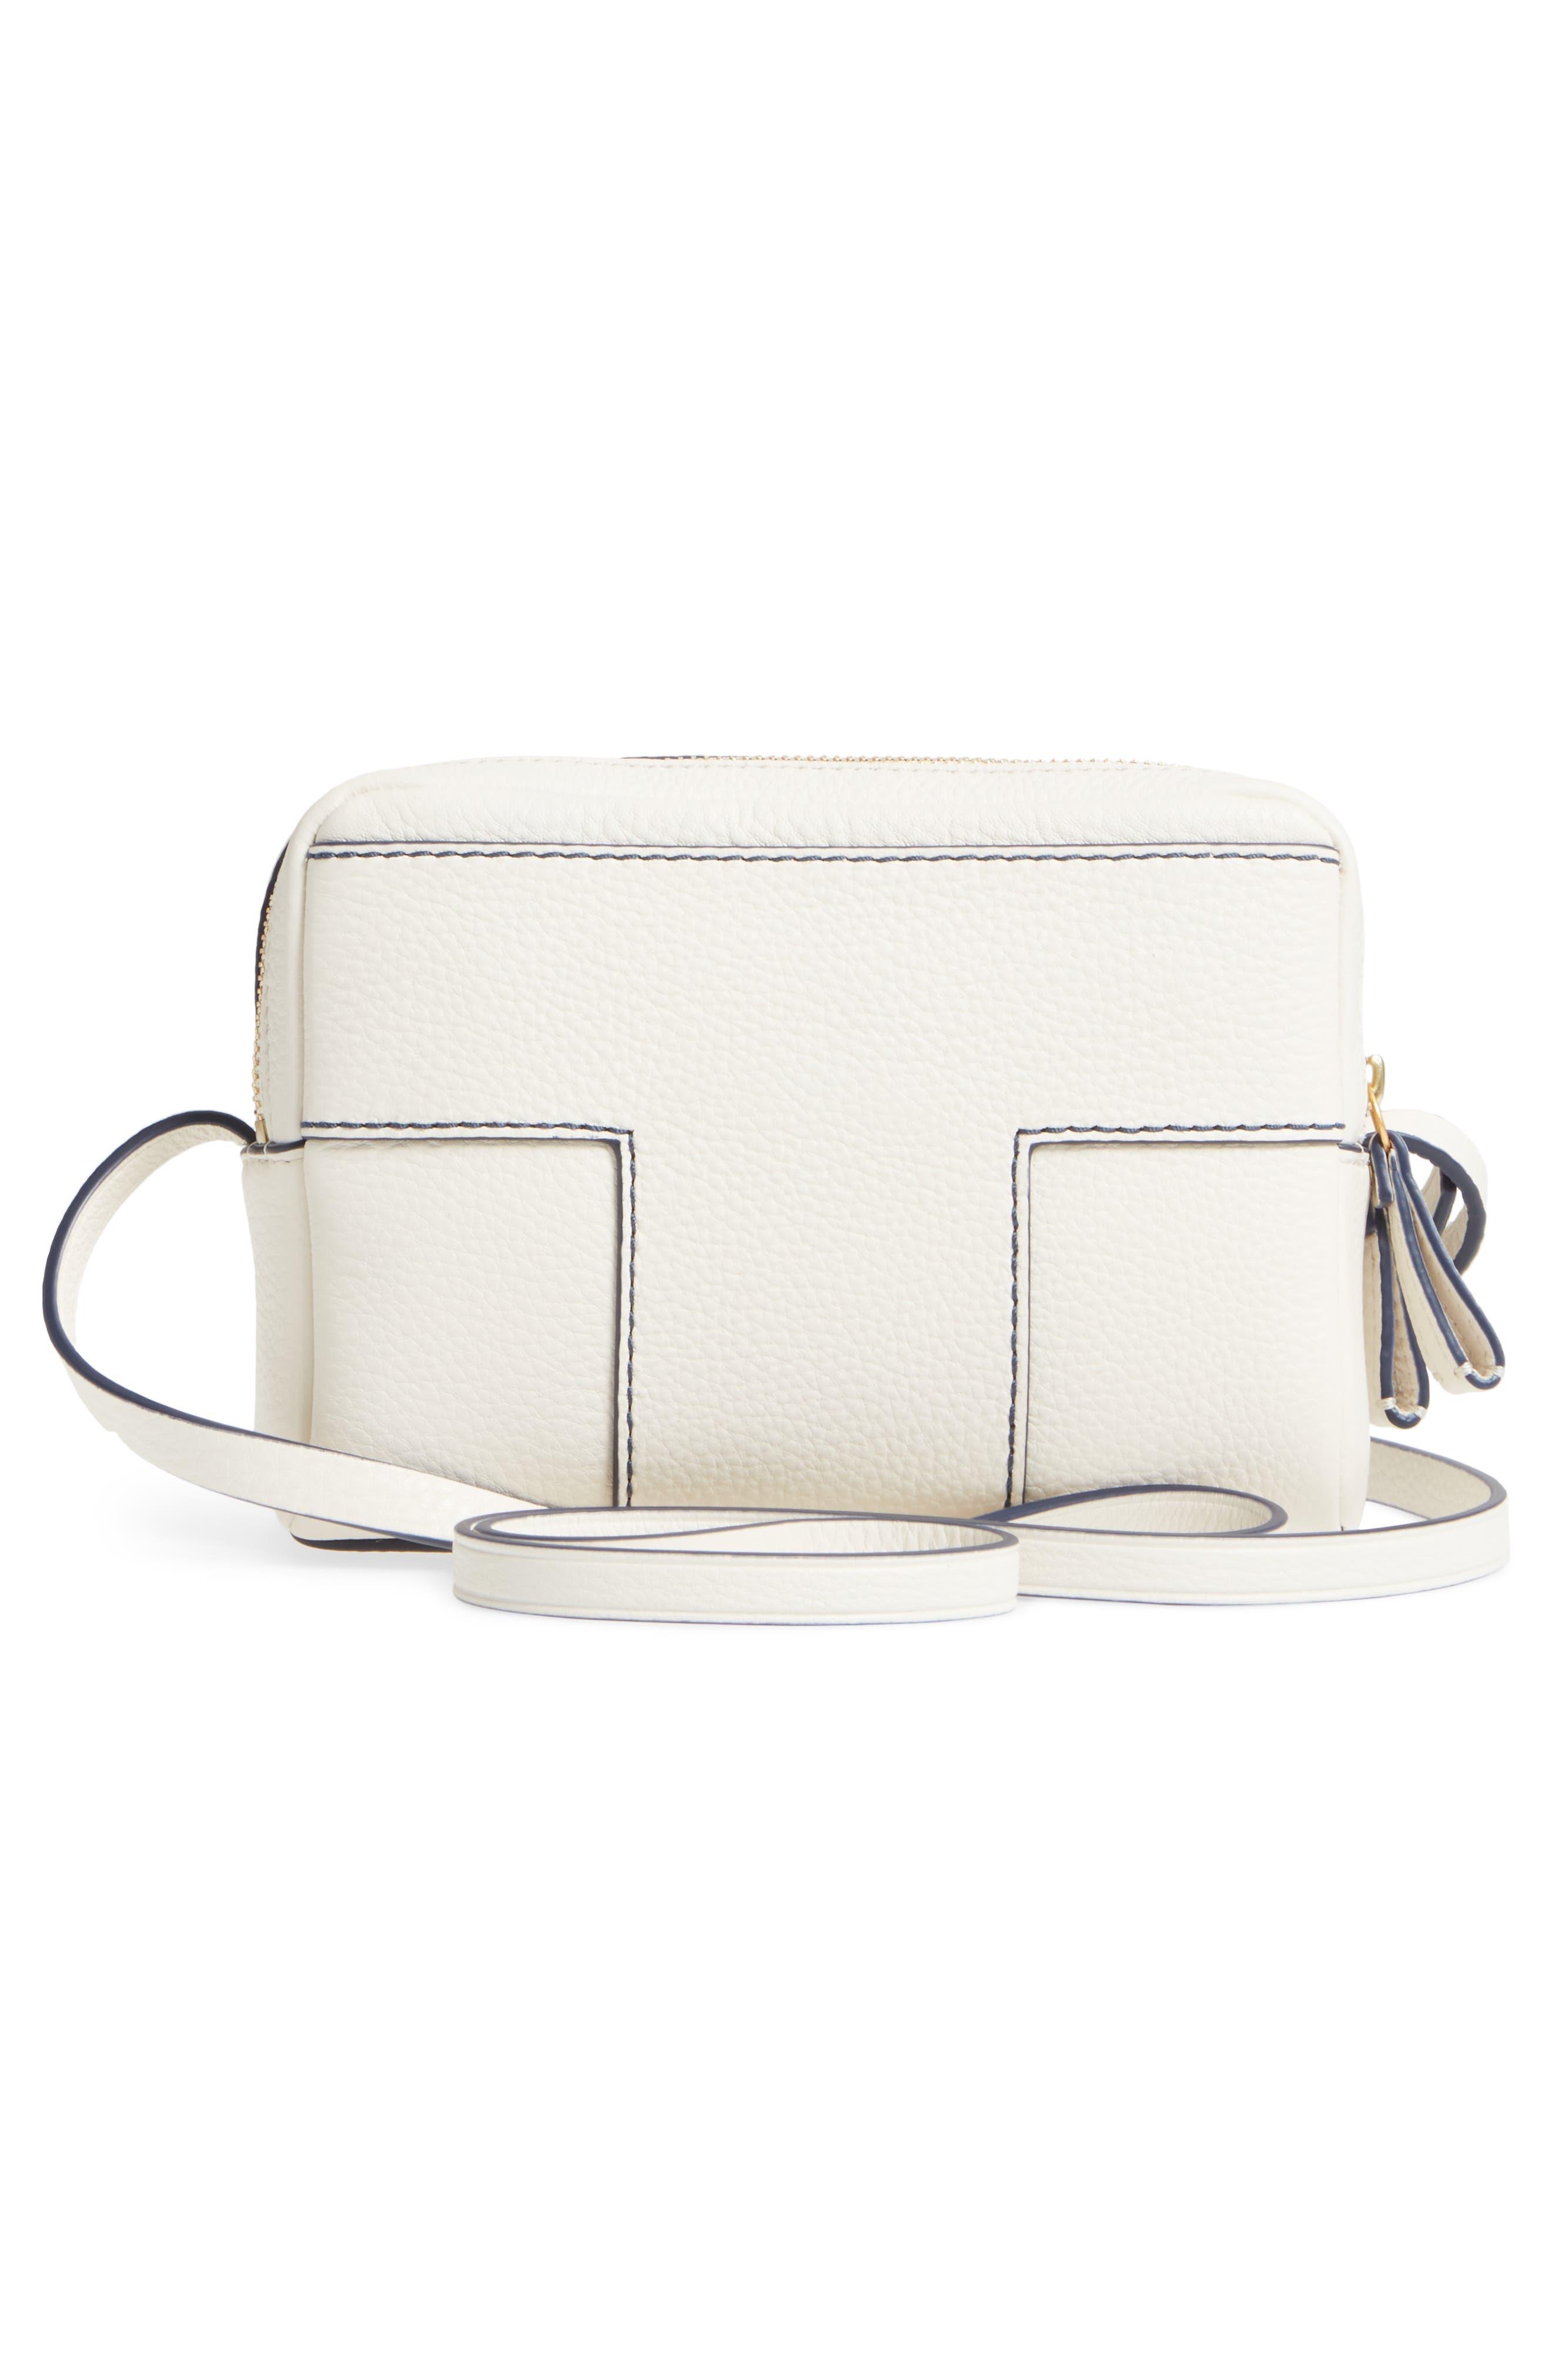 Block-T Double Zip Leather Crossbody Bag,                             Alternate thumbnail 3, color,                             100